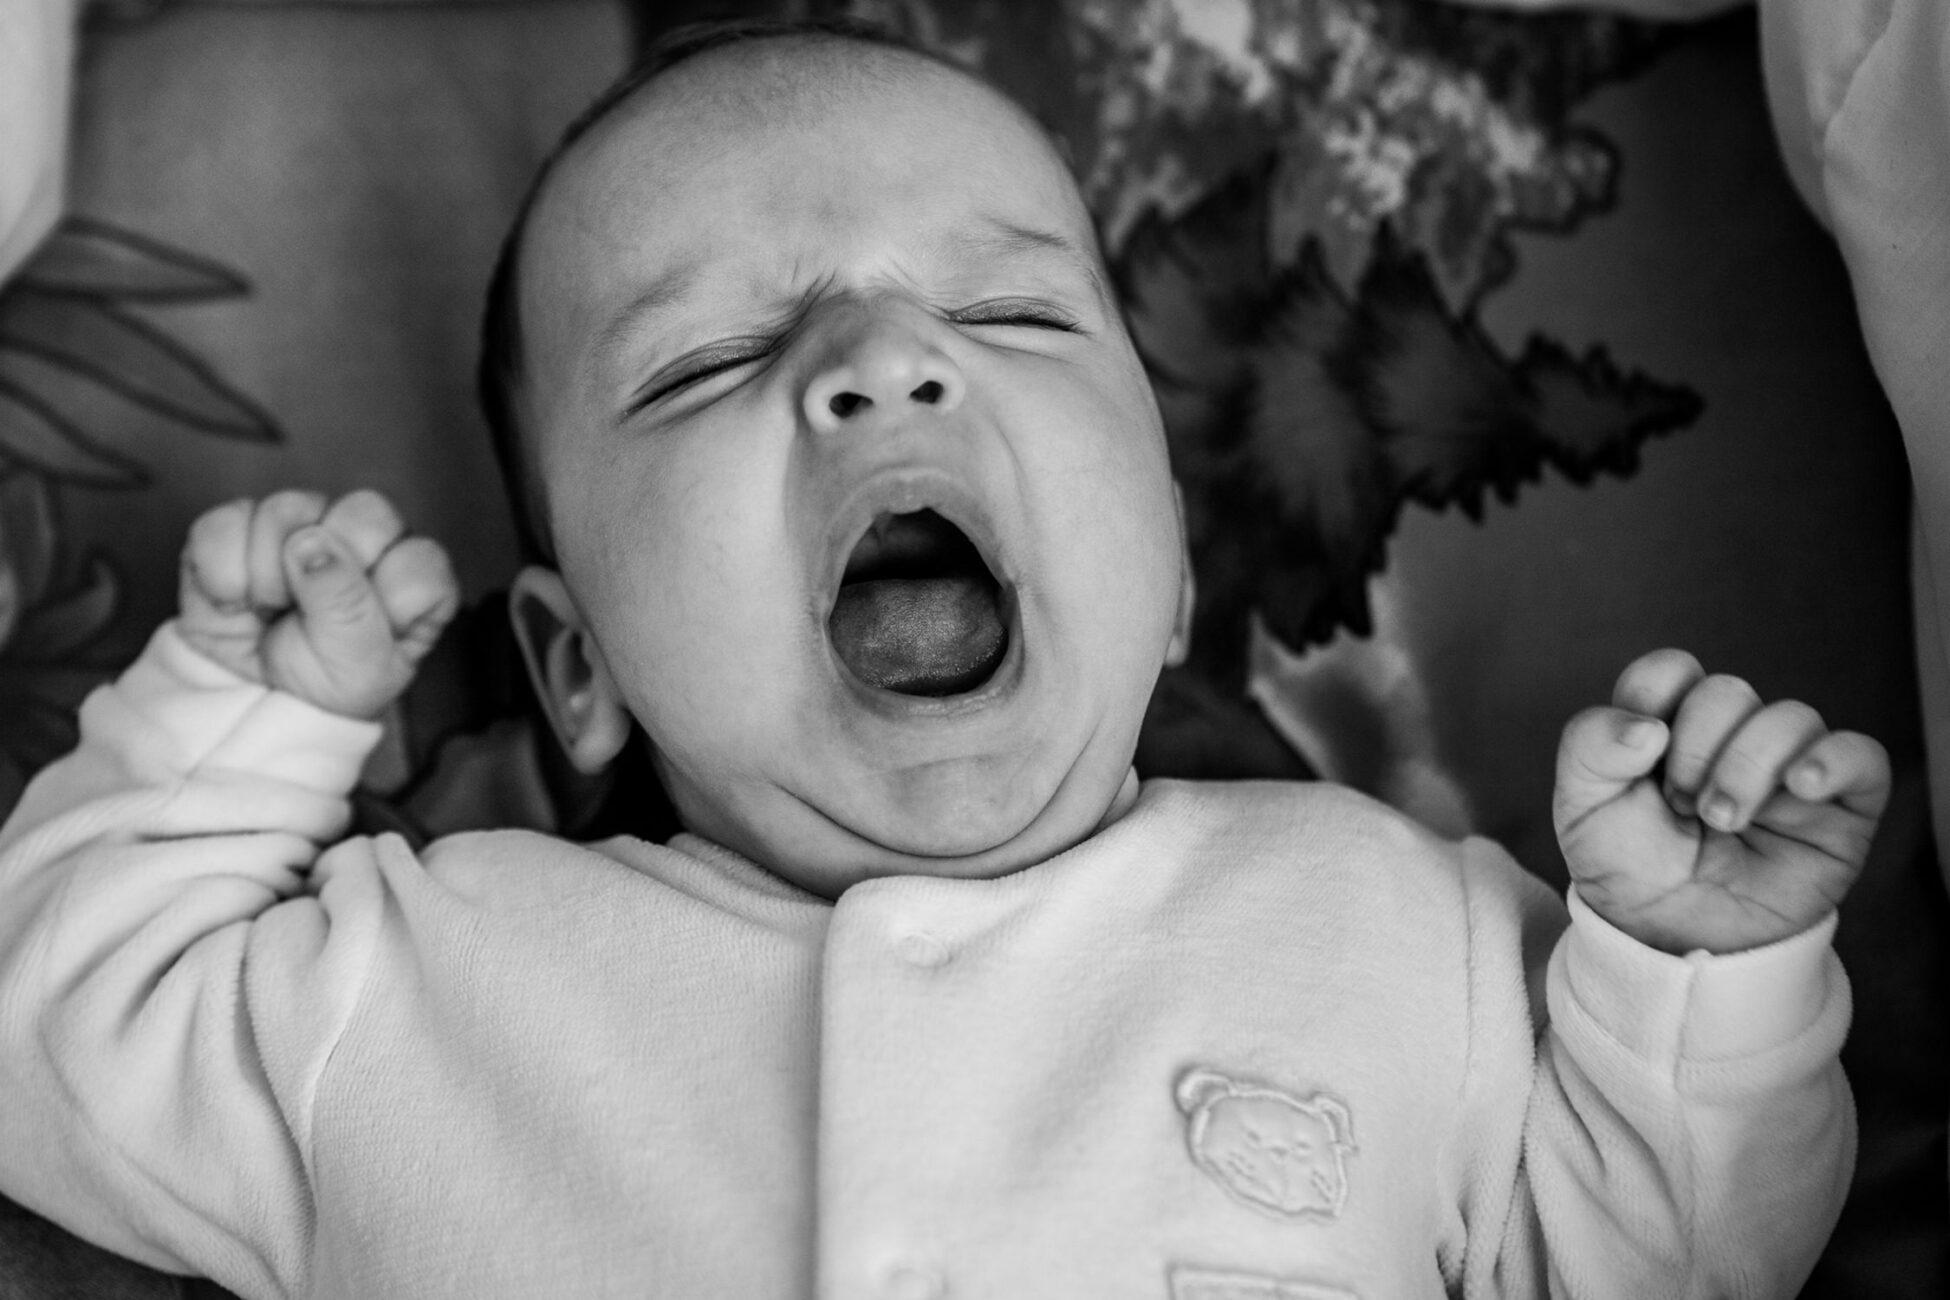 newborn baby boy yawning